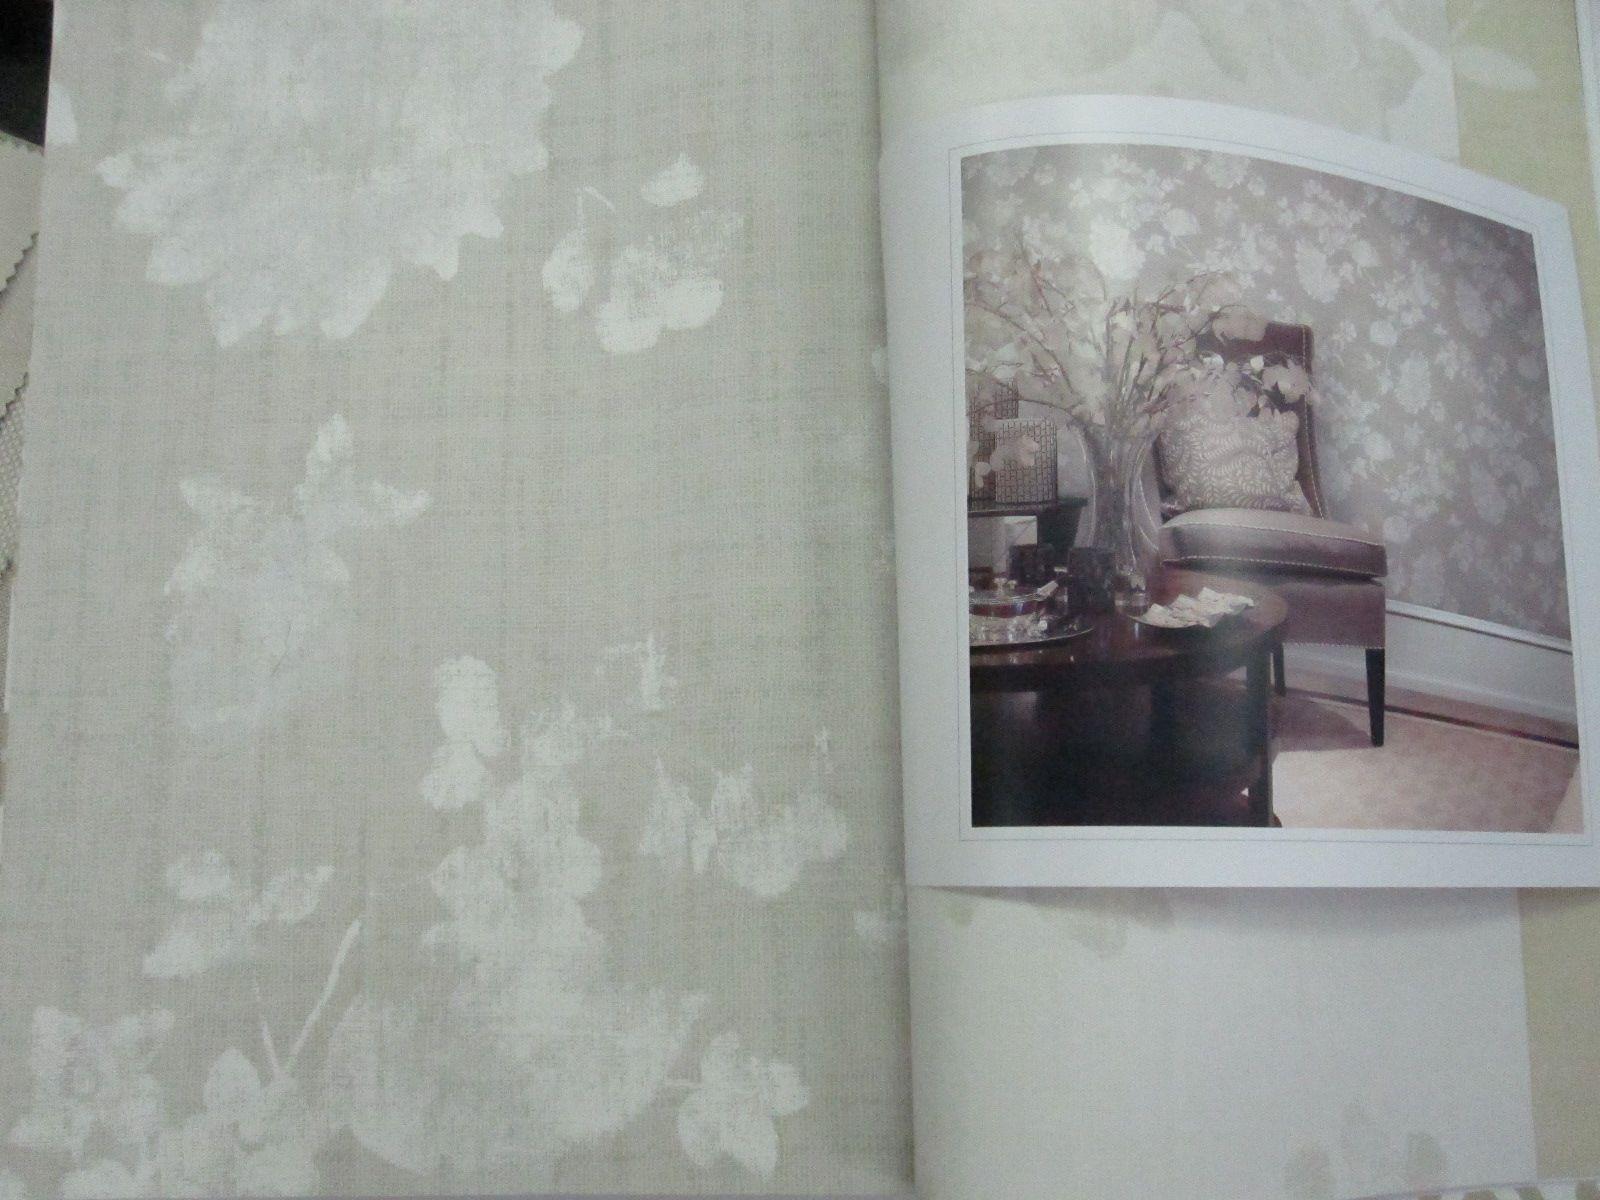 benjamin moore wallpaper LUUUX Wallpaper, Decor, Home